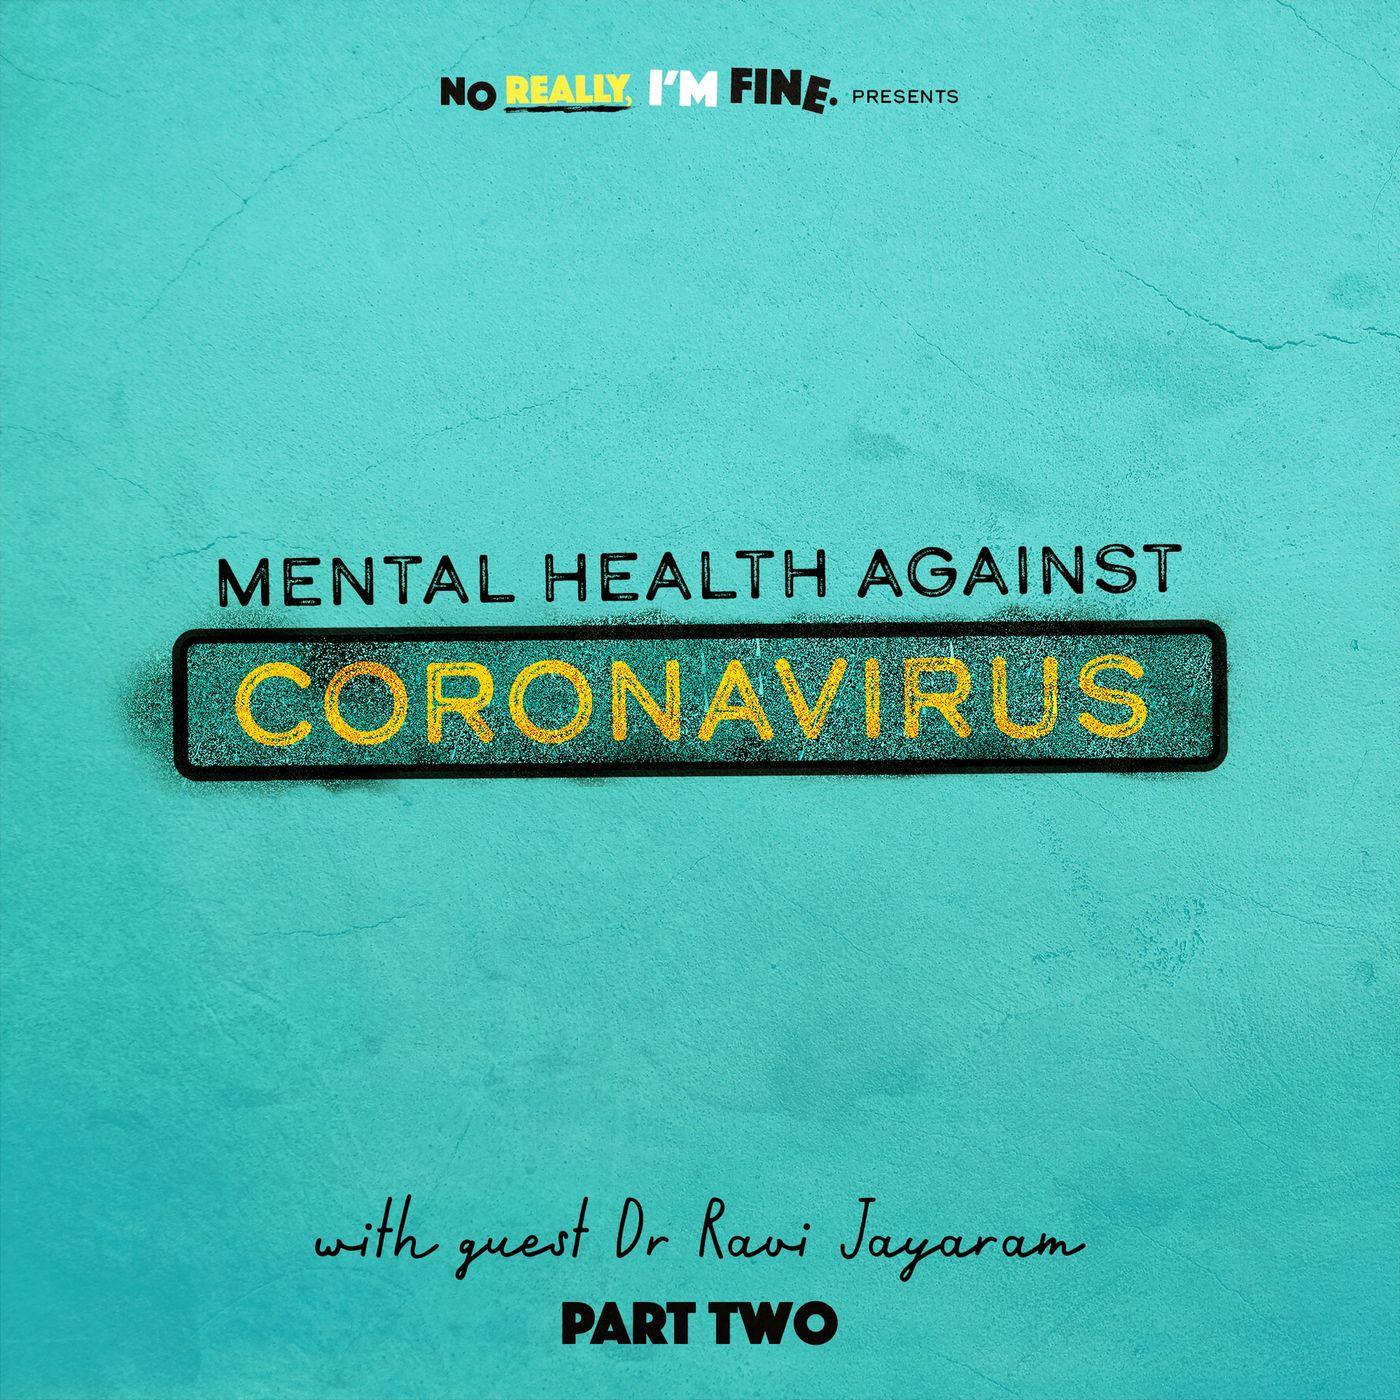 No Really, I'm Fine - Dr Ravi Jayaram gives help to parents during Coronavirus pandemic